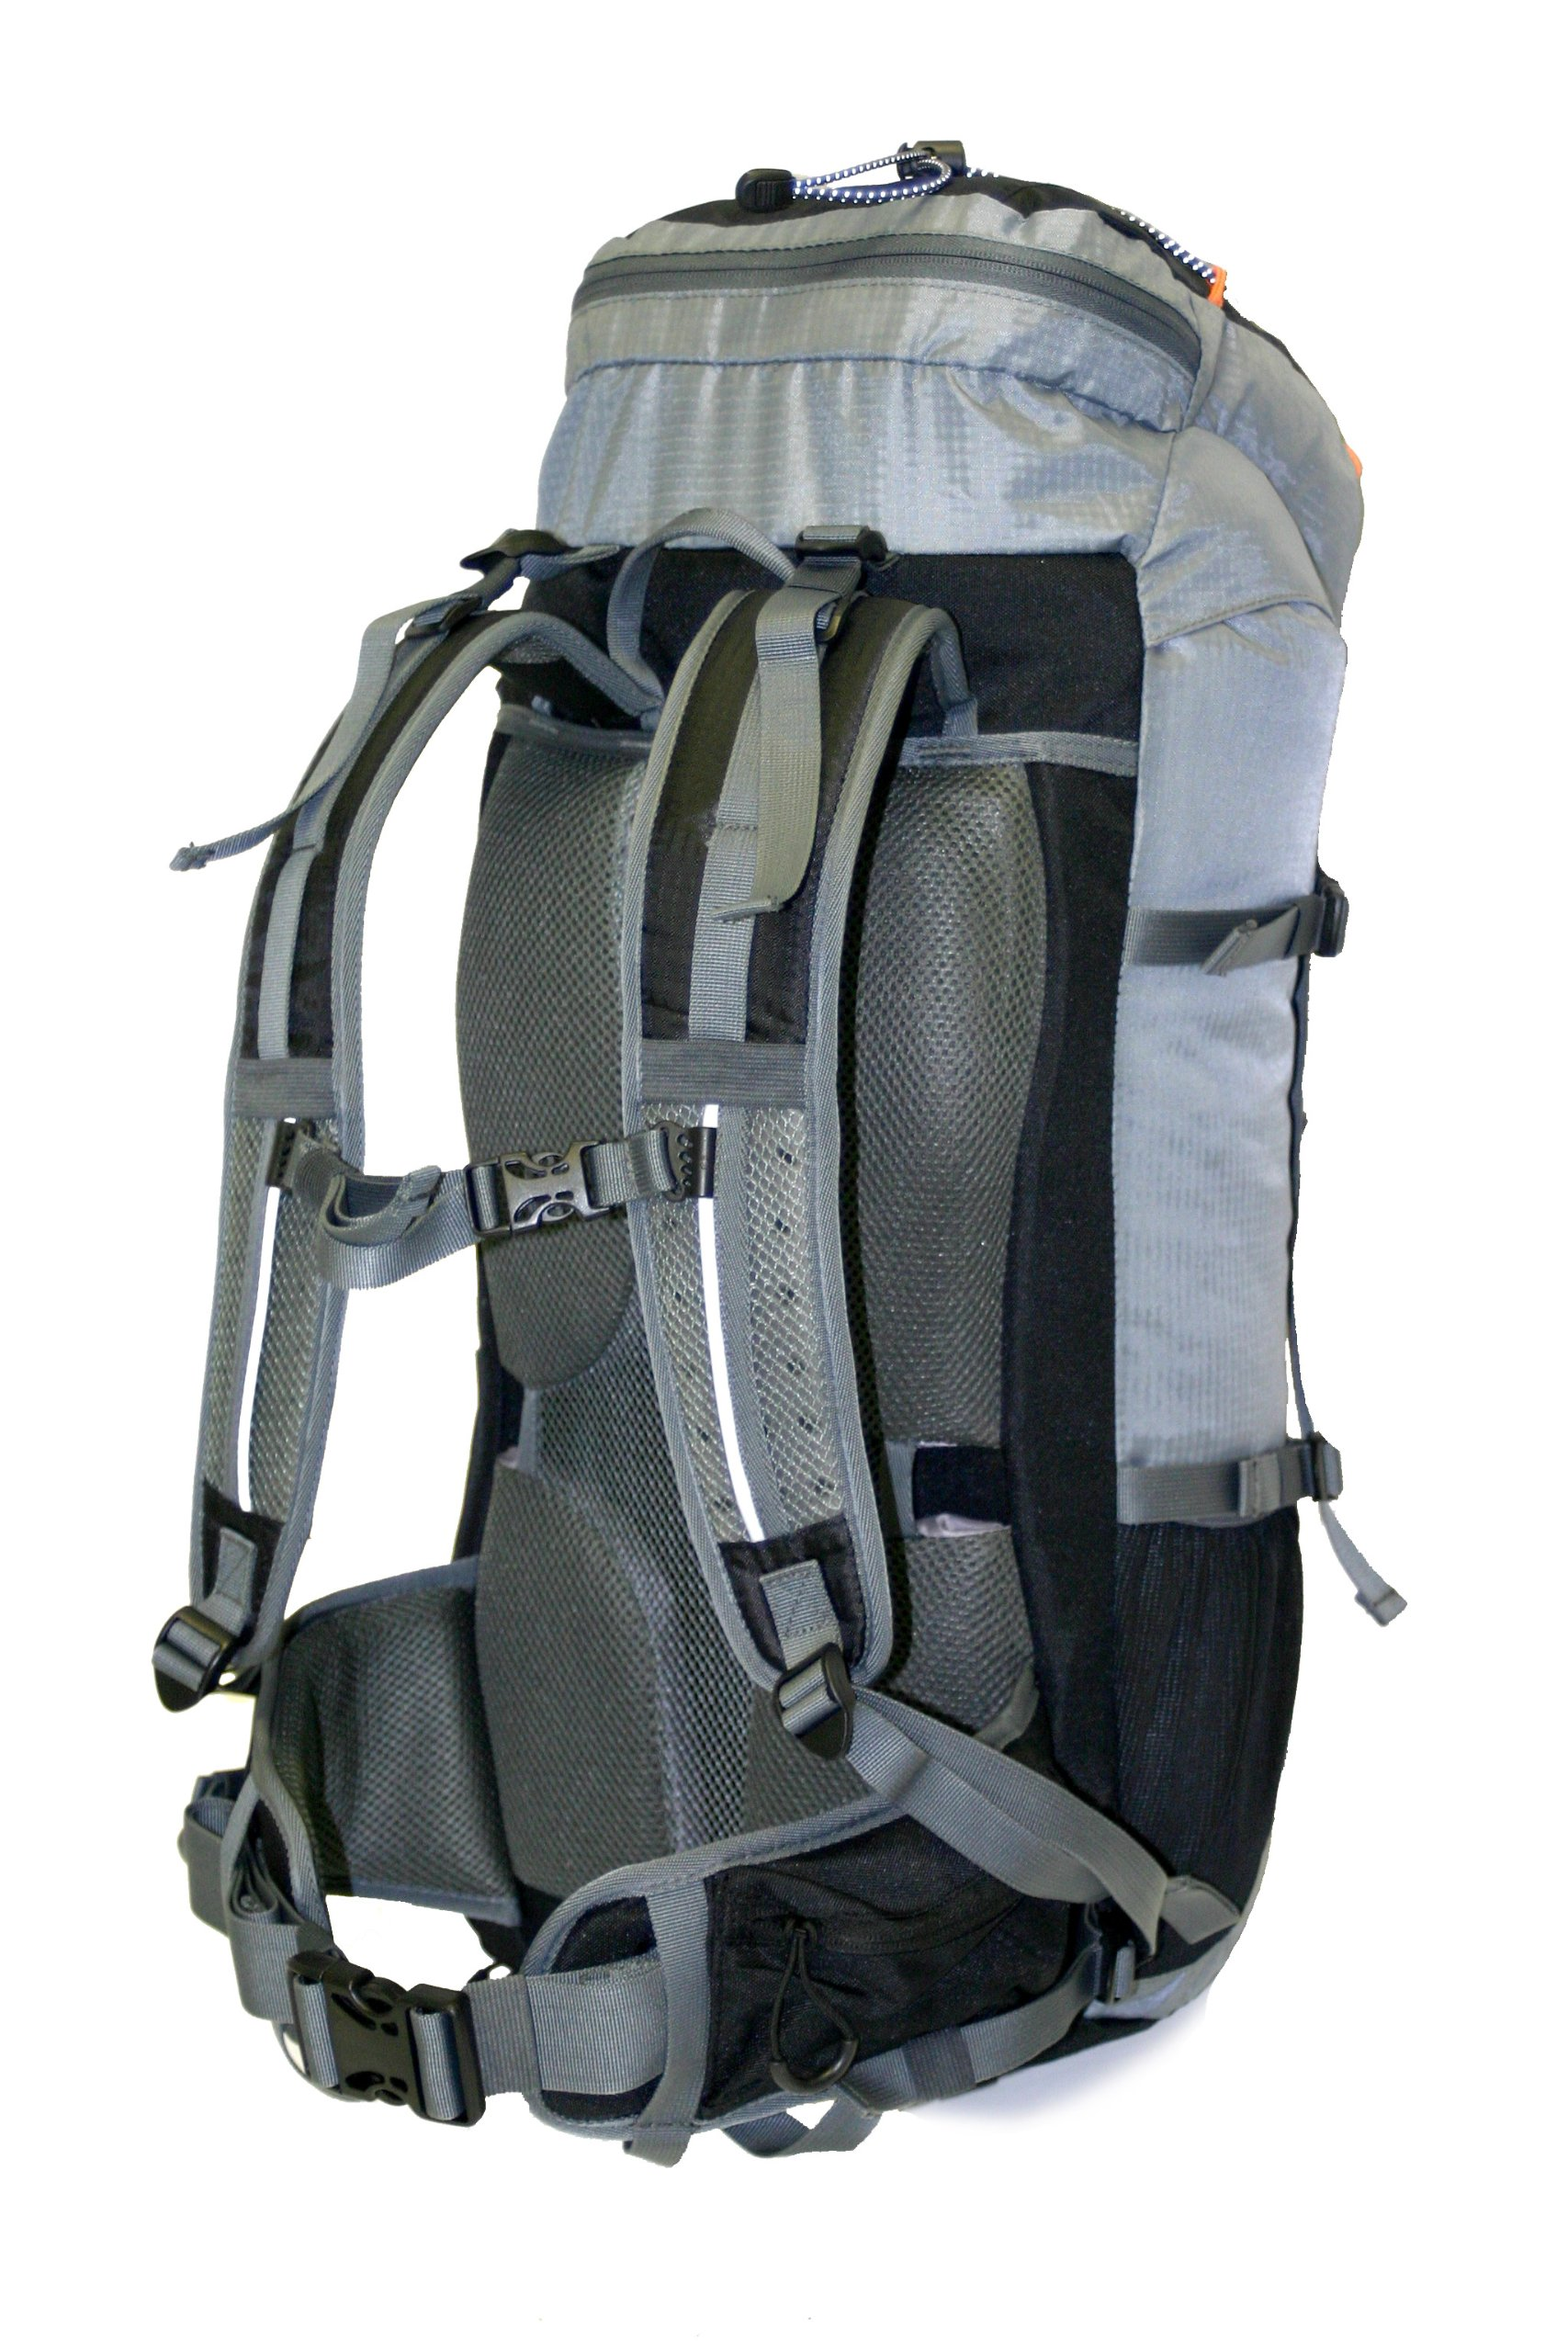 81cjSrrjX0L - MONTIS Leman 45, Mochila de Ruta, Trekking y Viajes, 45 l, 1300 g